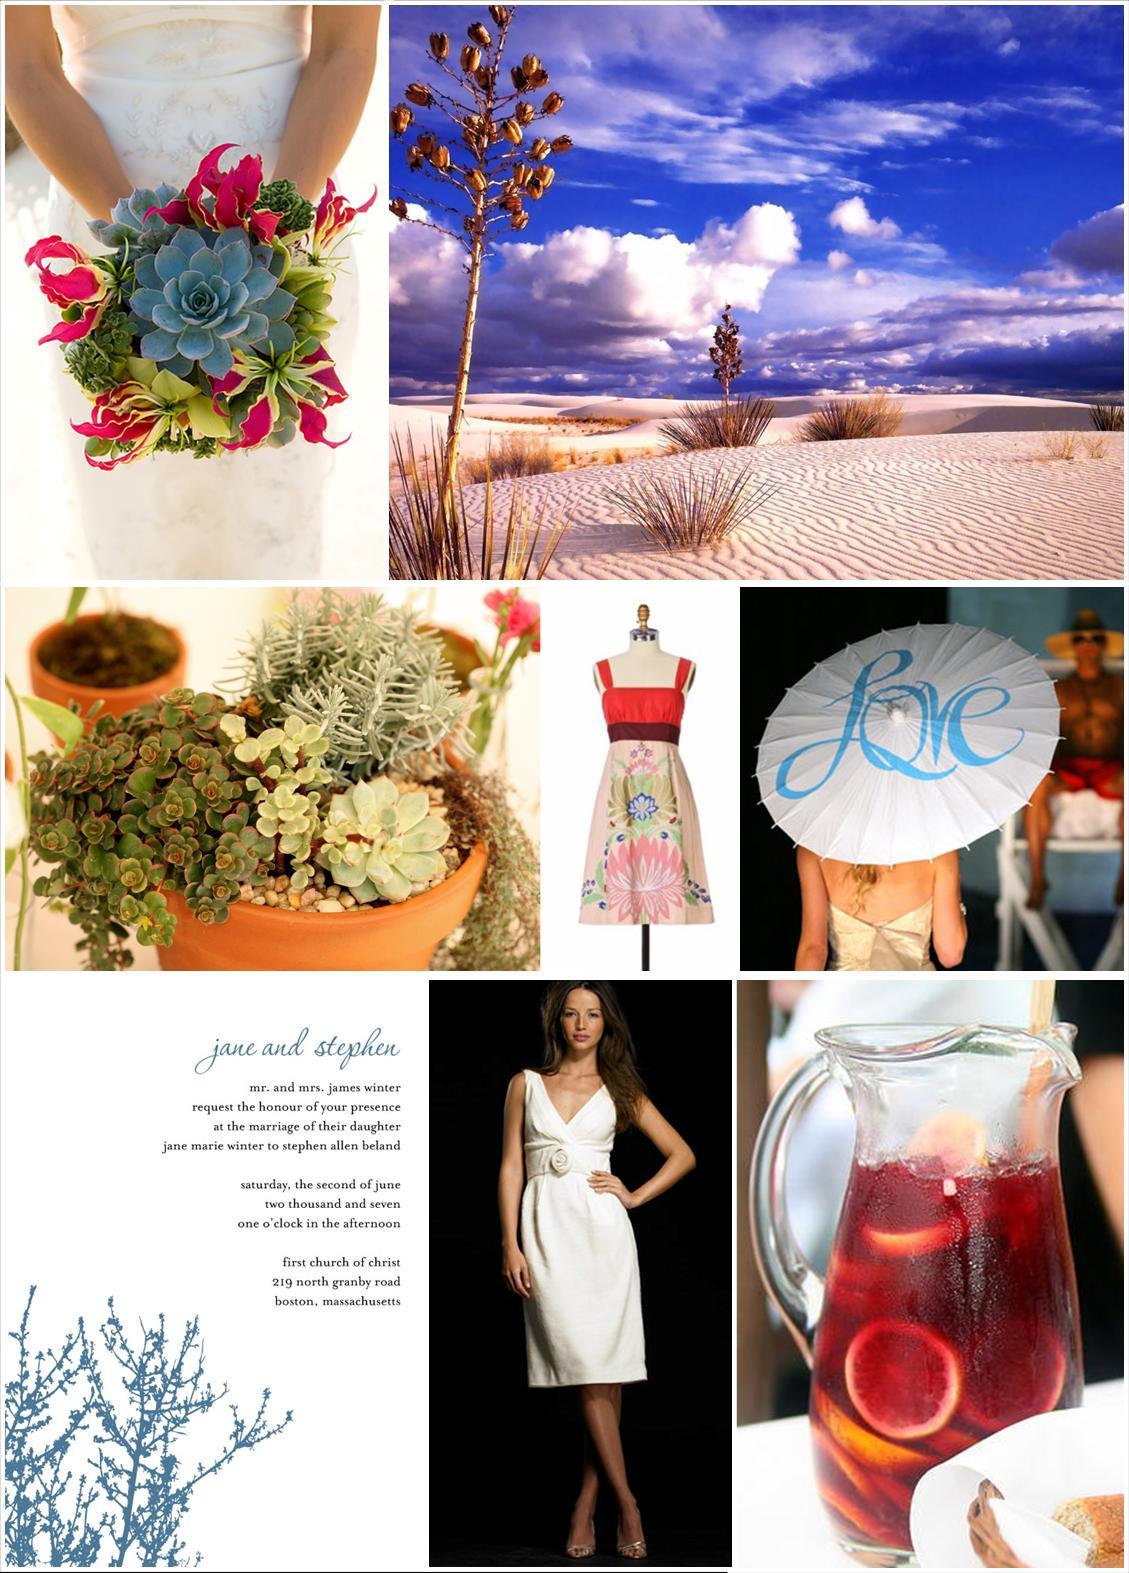 desert wedding inspiration board